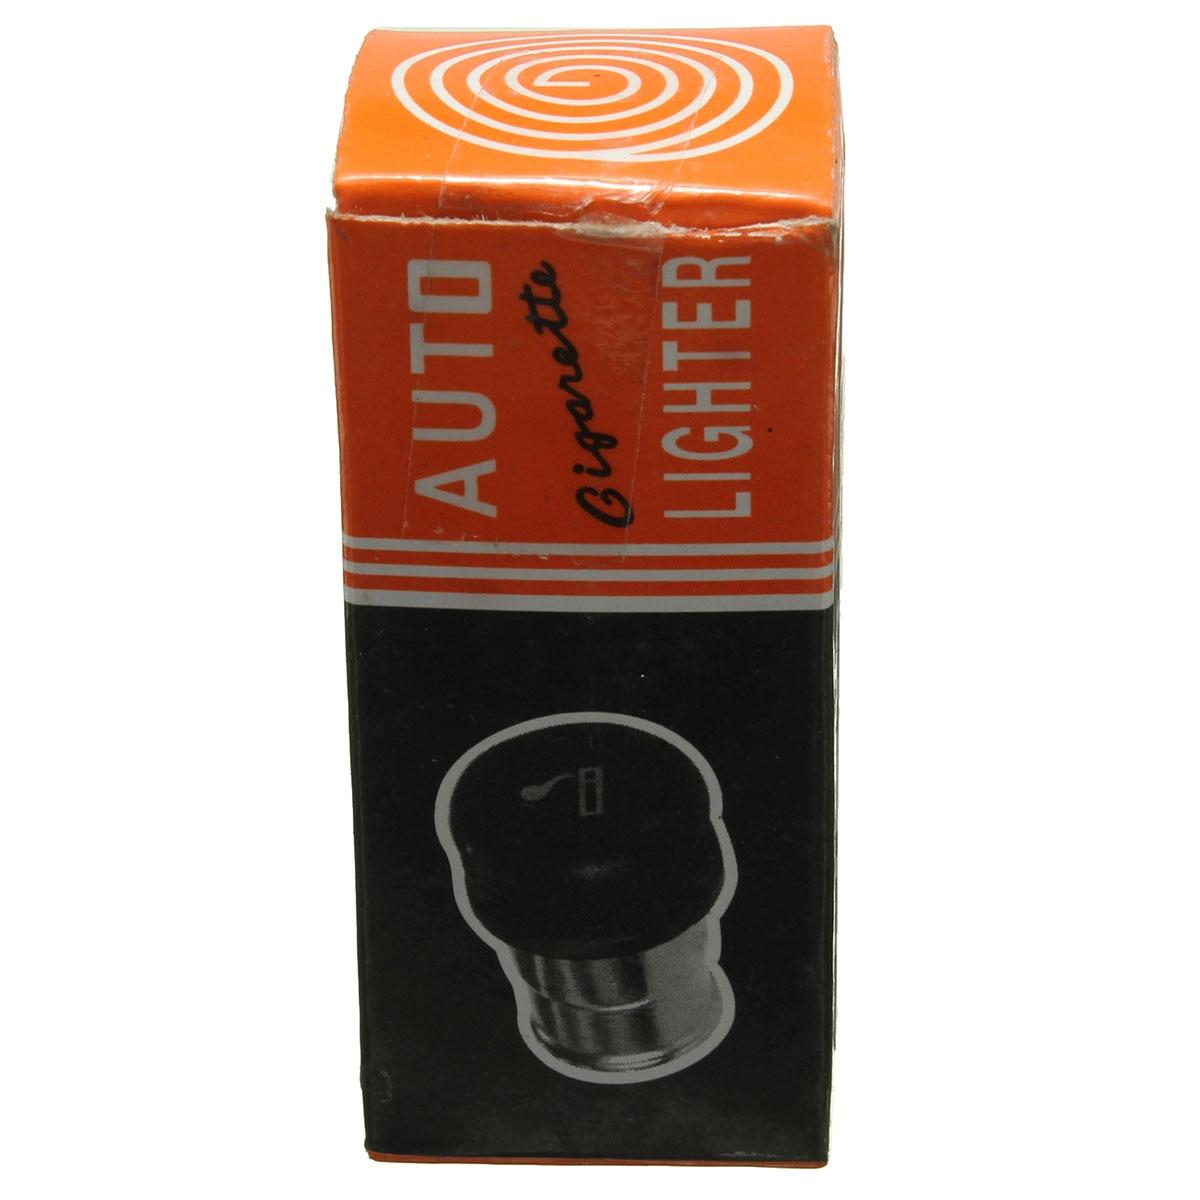 new black universal 12v car auto cigarette cig lighter element plug for vauxhall zafira astra corsa [ 1200 x 1200 Pixel ]